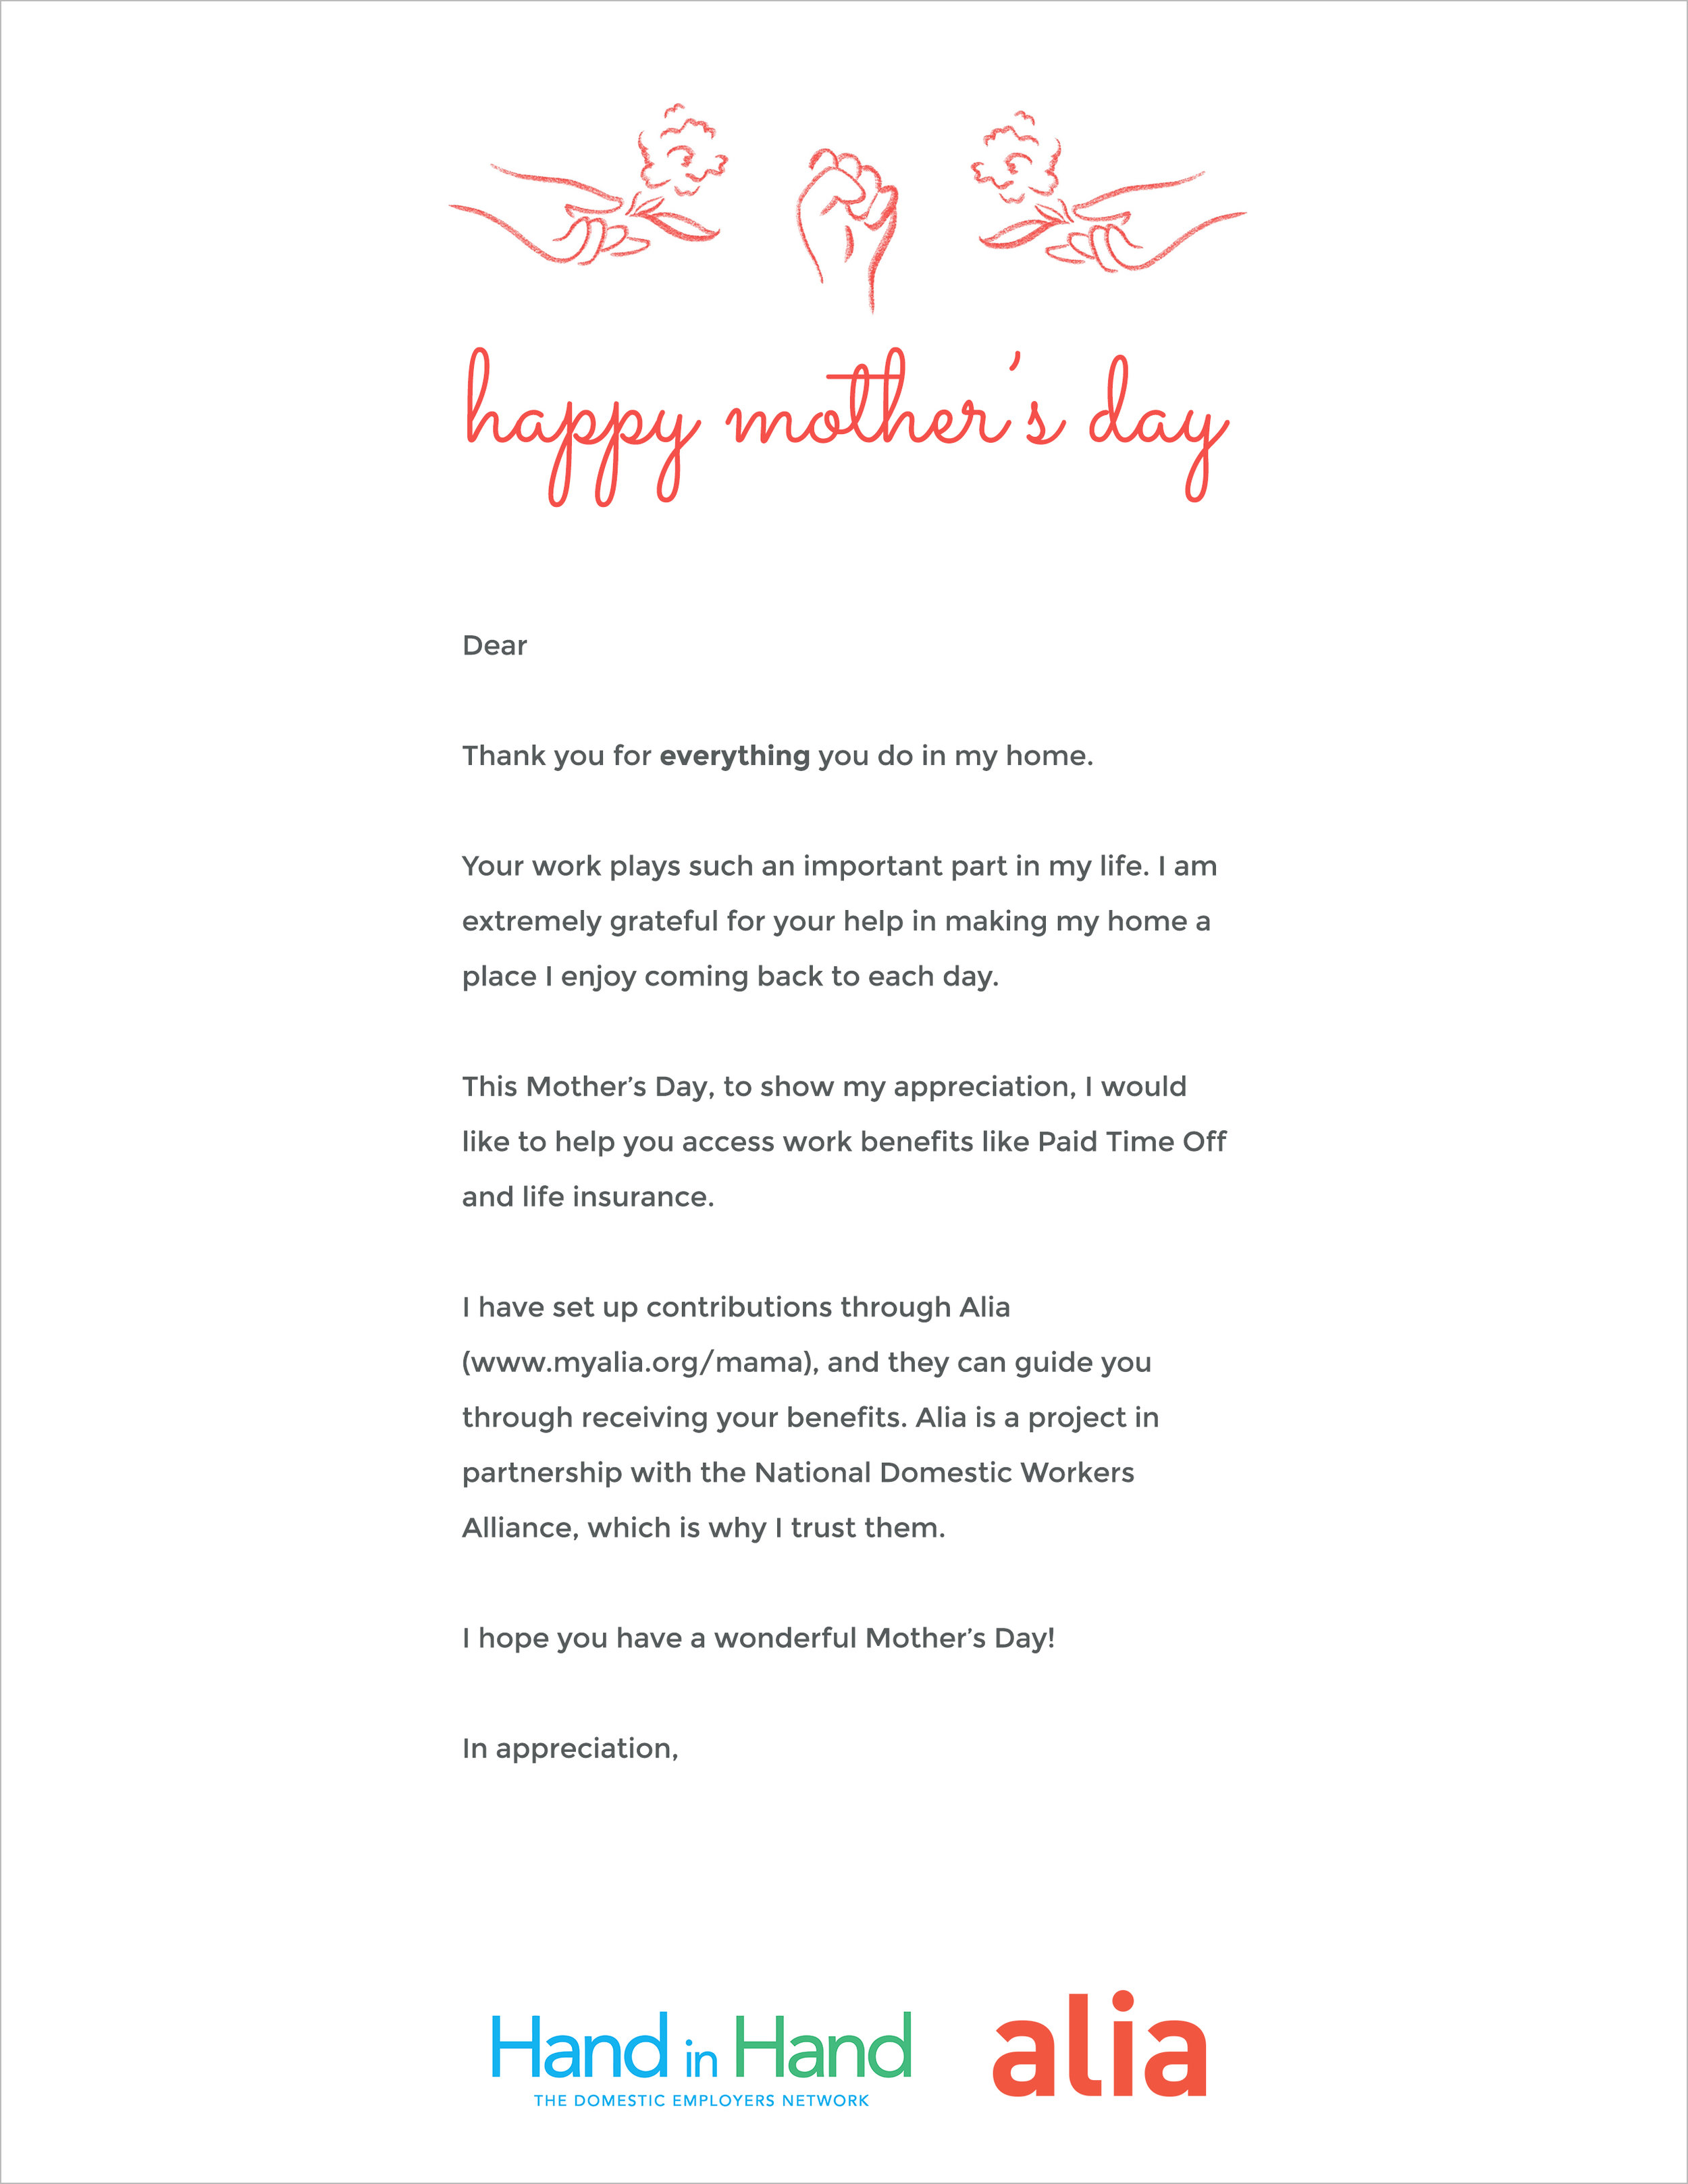 MothersDayCard_3_hih_SS_English.jpg